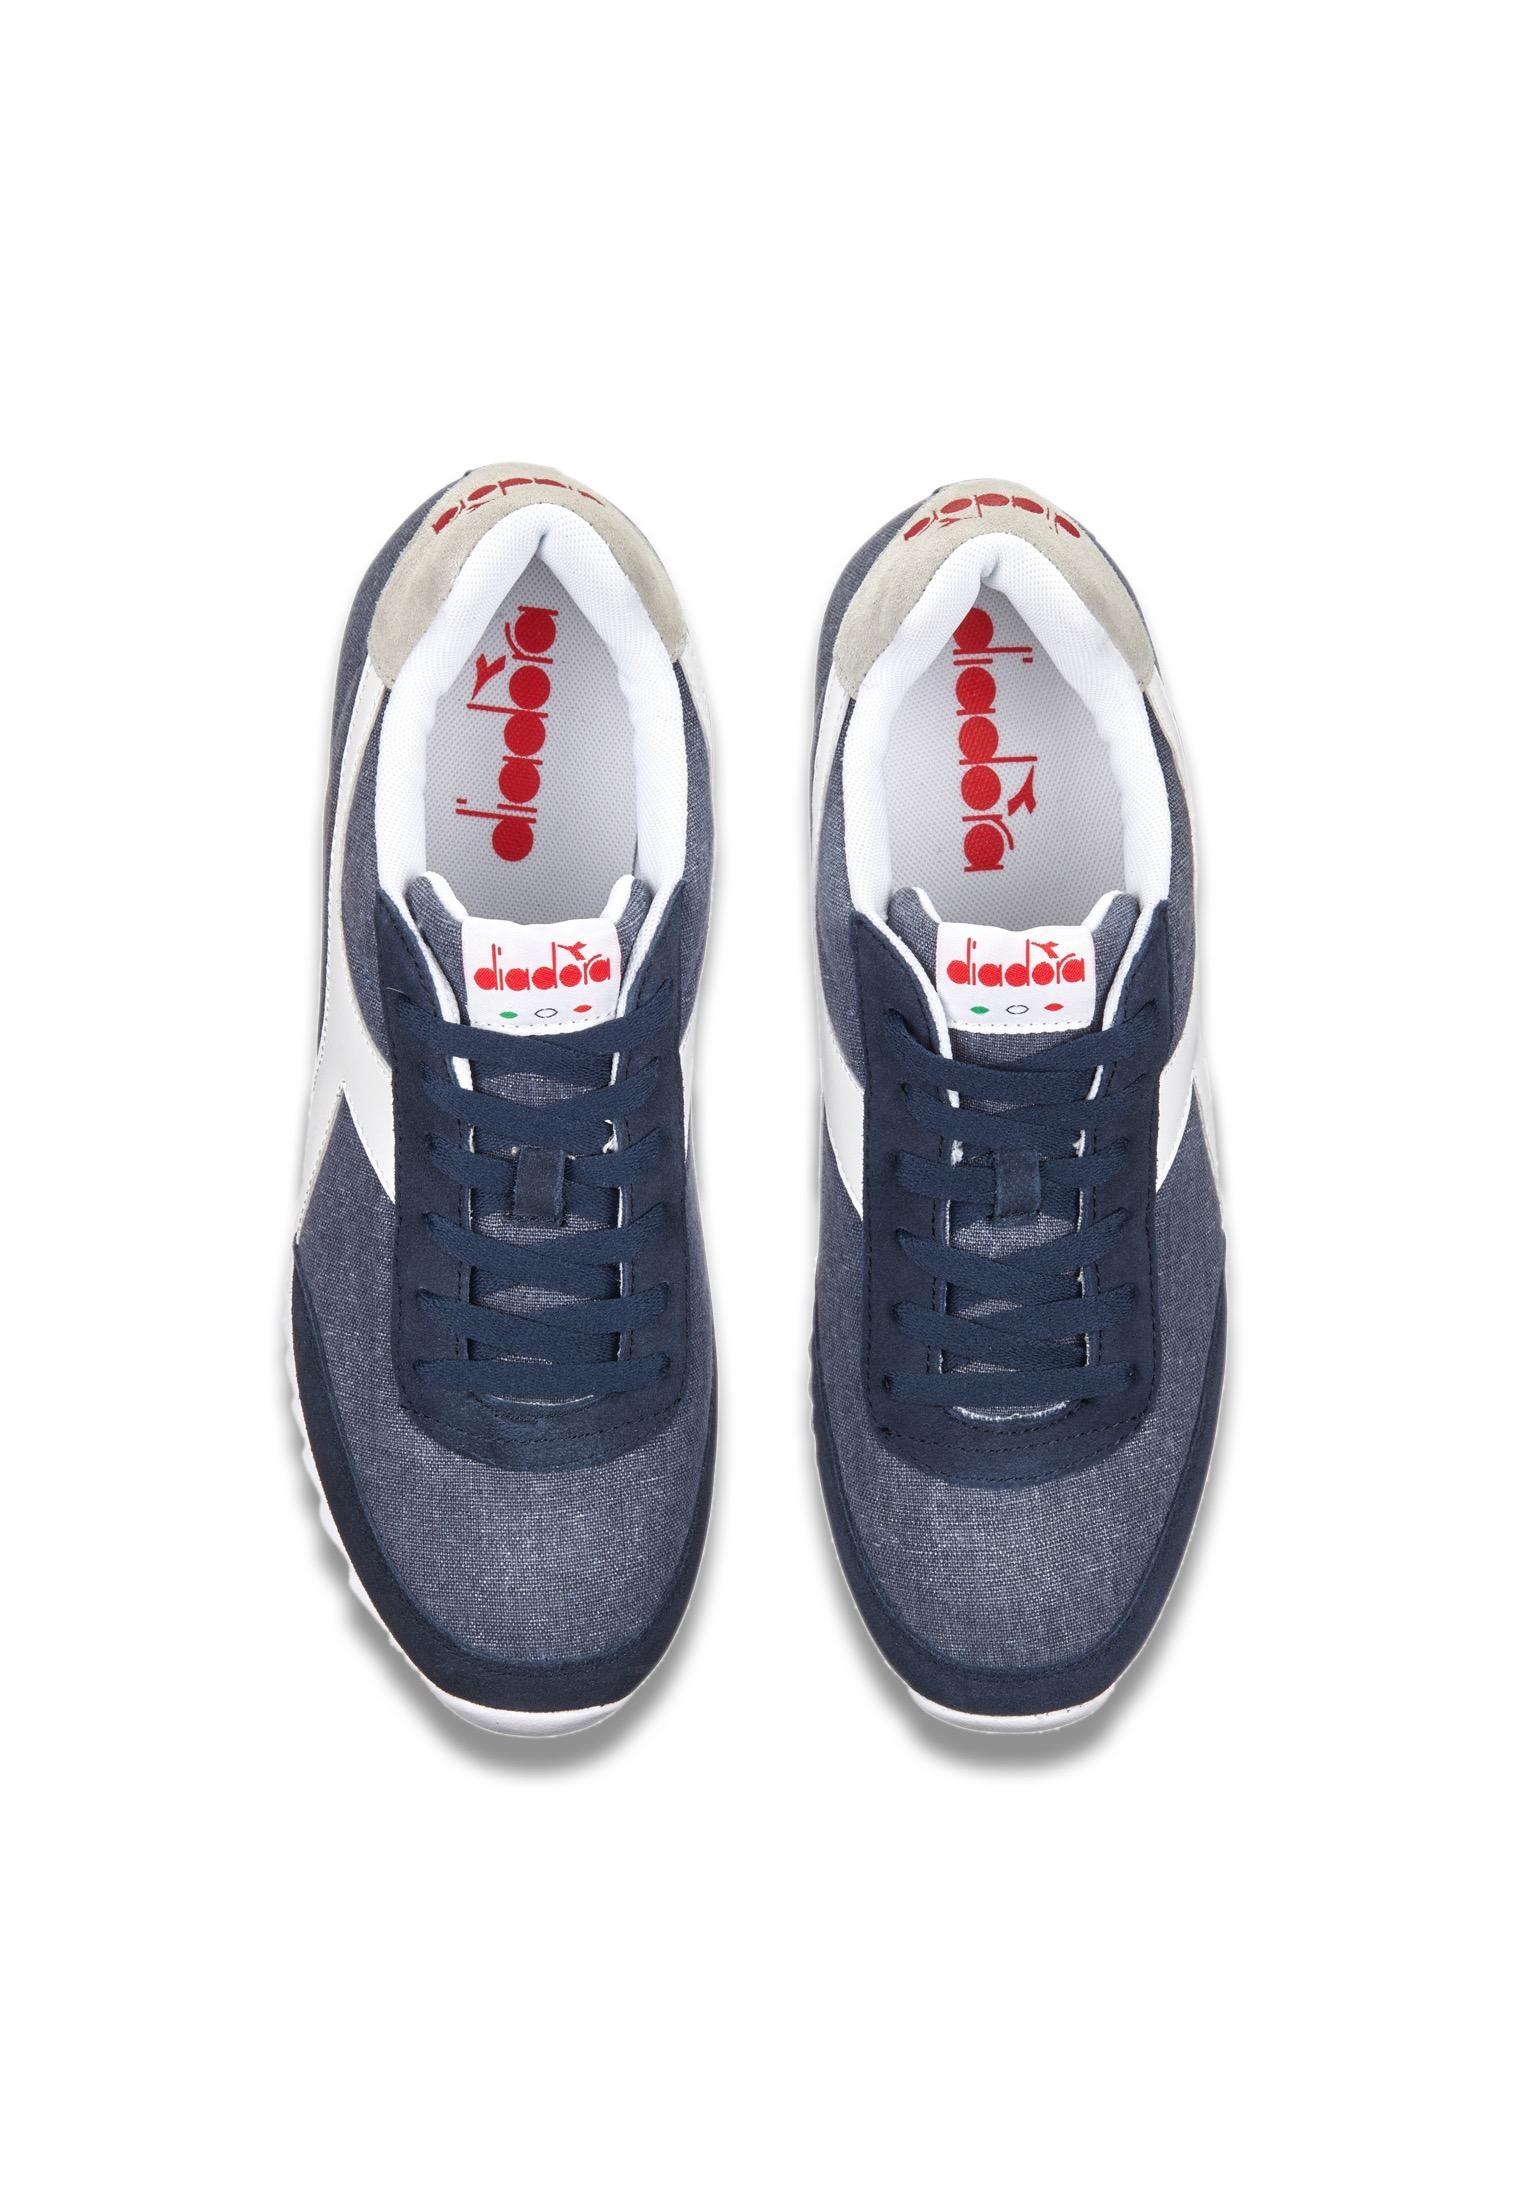 Scarpe-Diadora-Jog-Light-C-Sneakers-sportive-uomo-donna-vari-colori-e-taglie miniatura 22